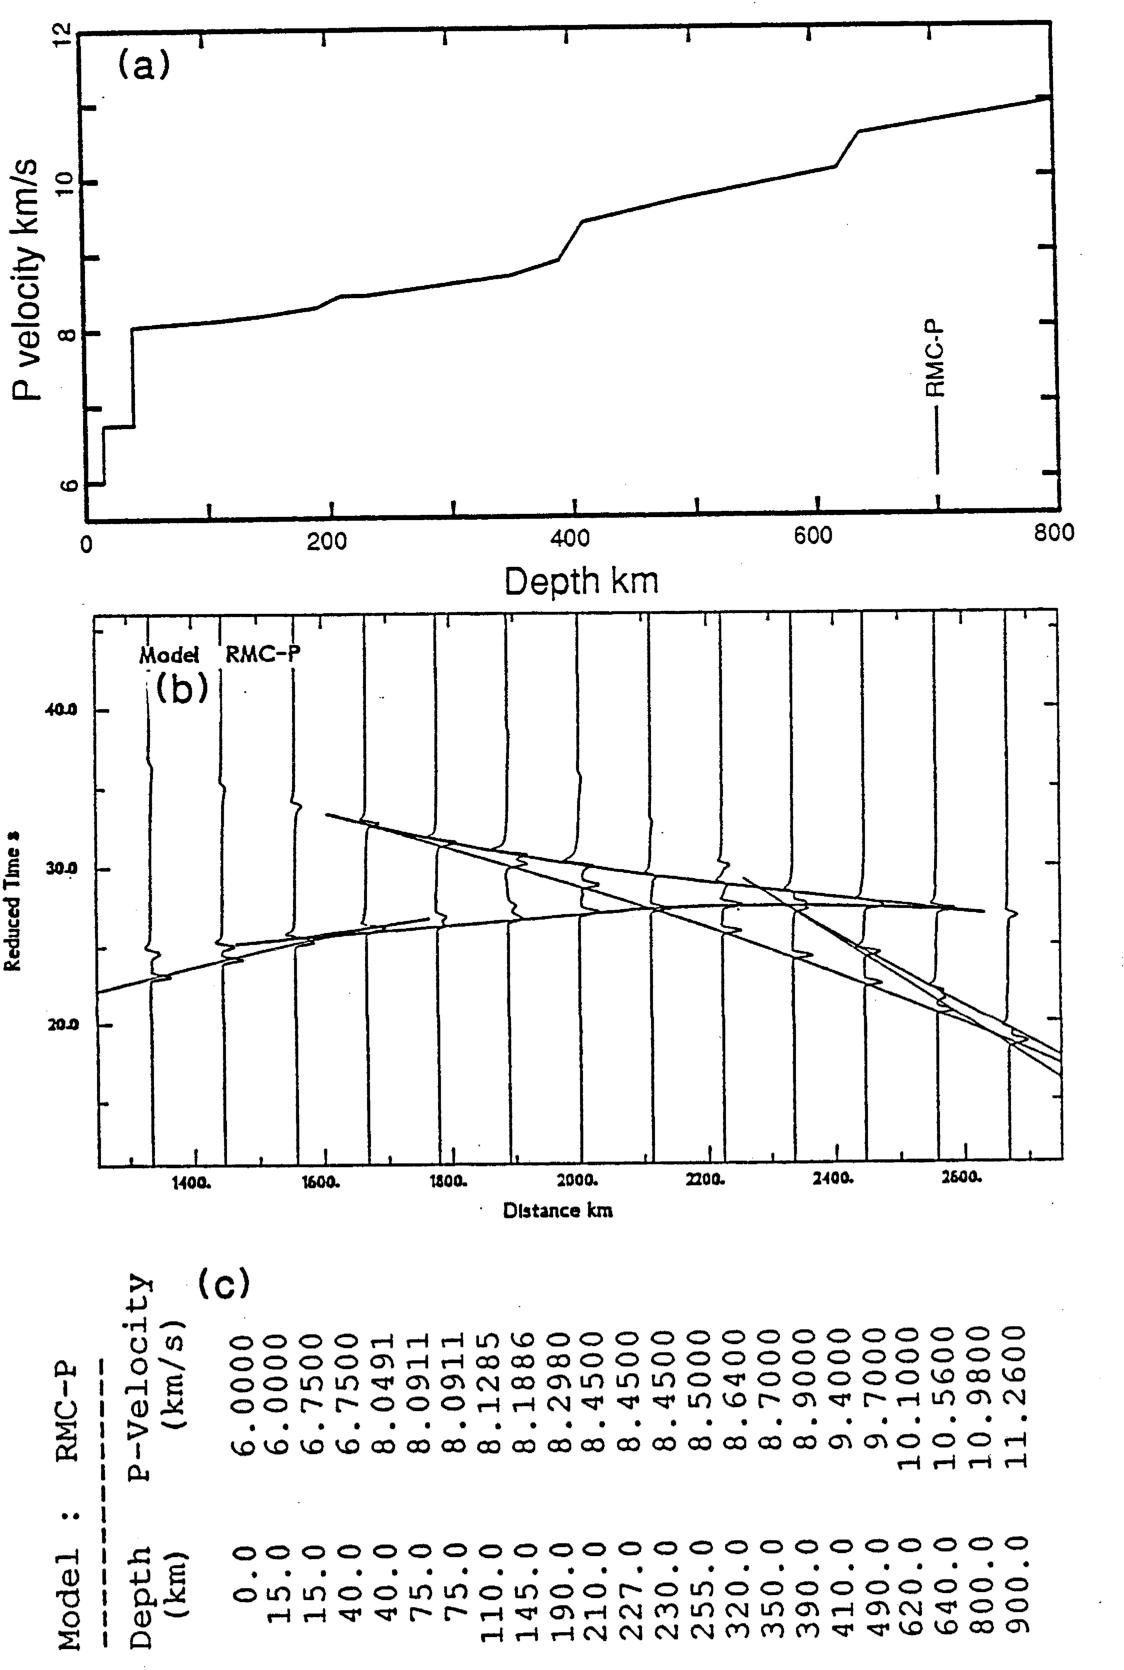 figure 6.2